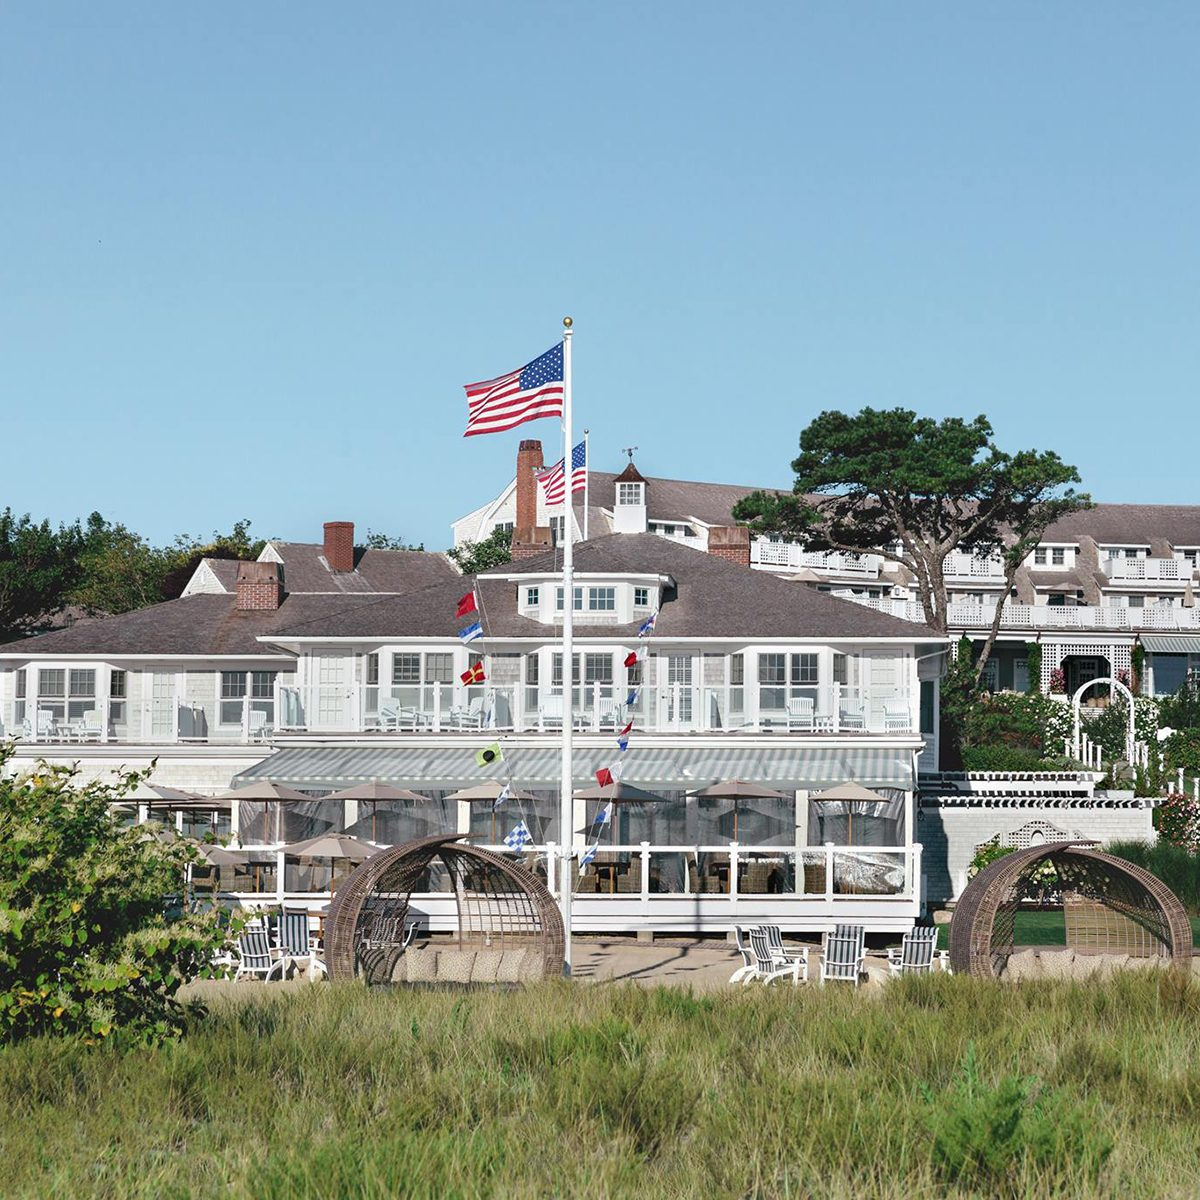 Massachusetts Chatham Bars Inn